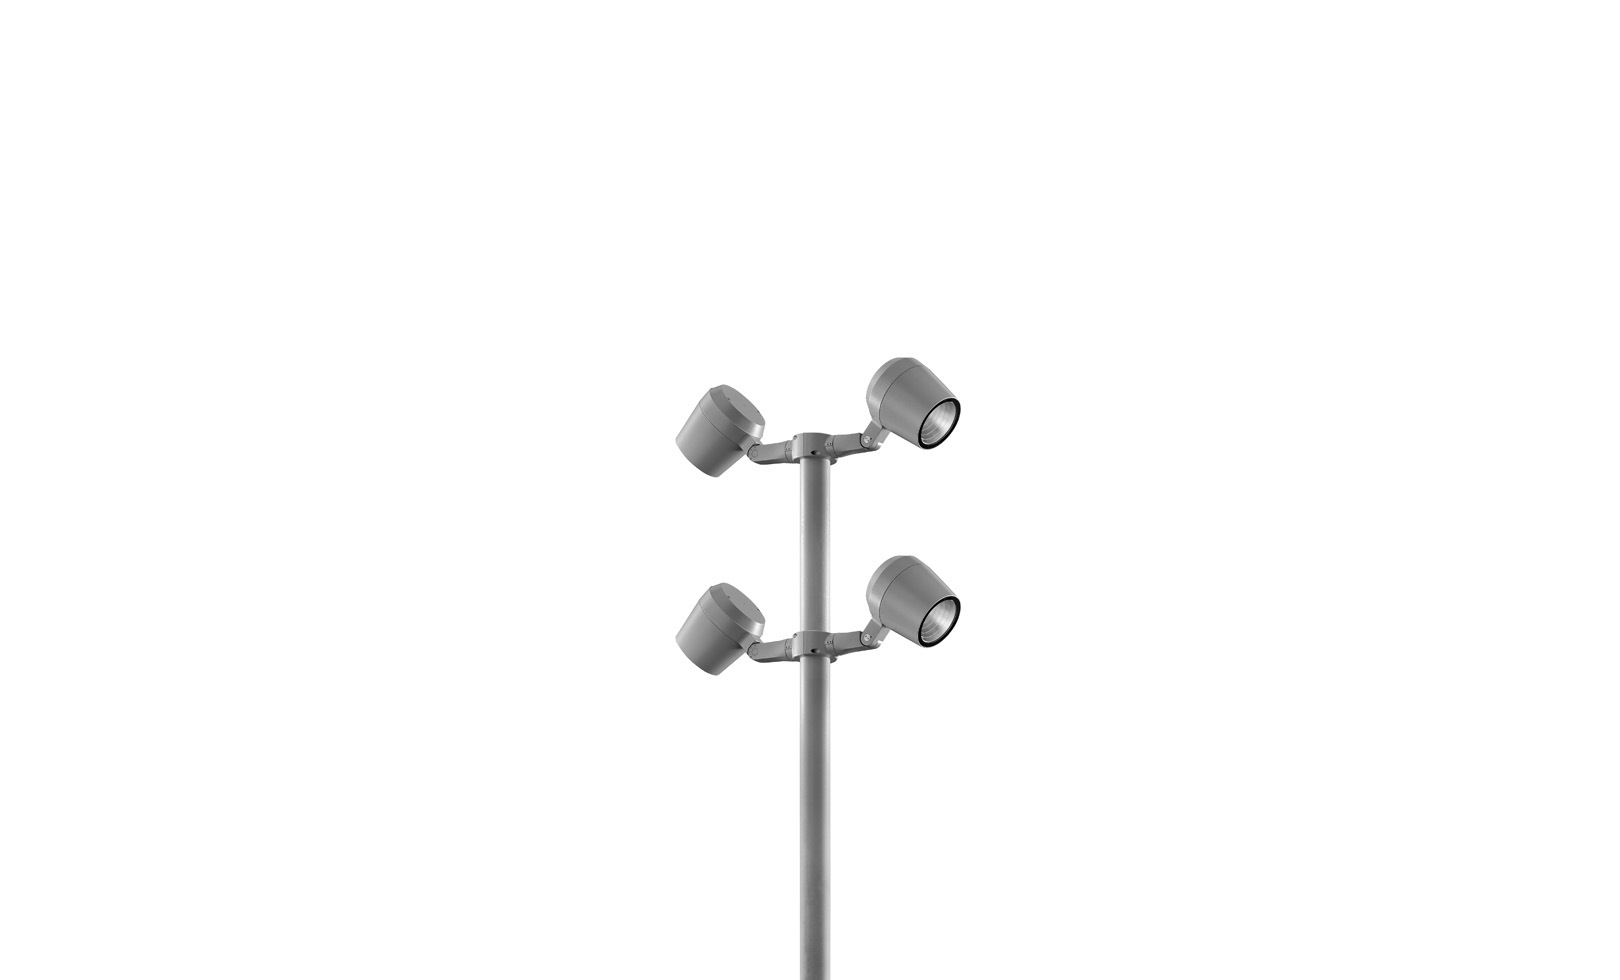 807003-807006 RING POLE MAXI LED 4